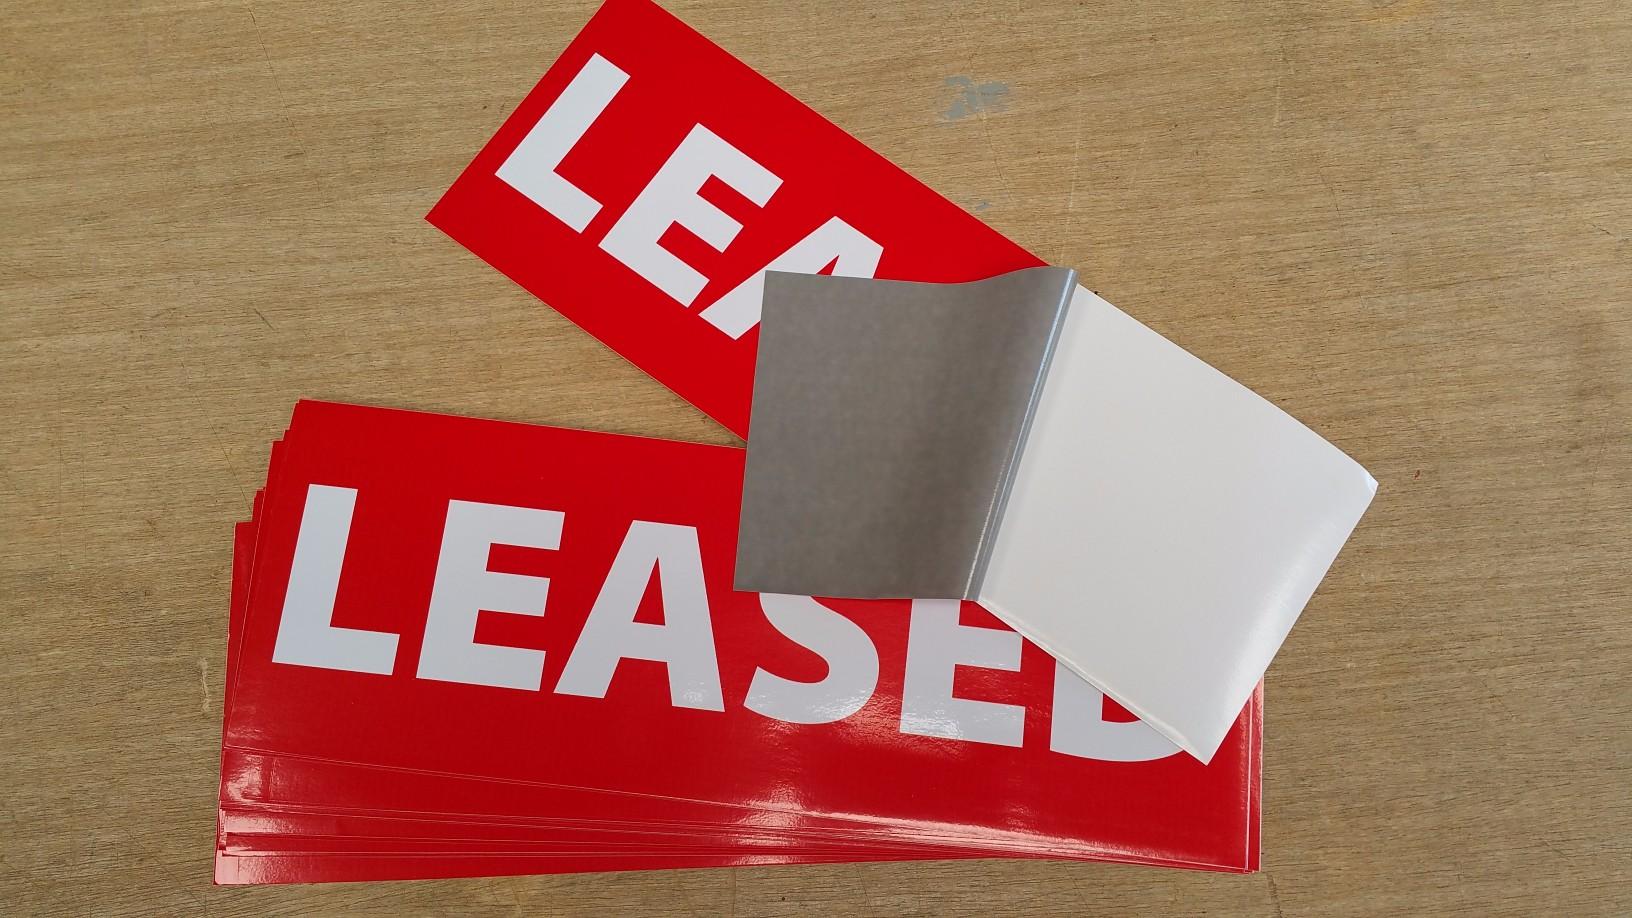 sold-sticker-leased1.jpg